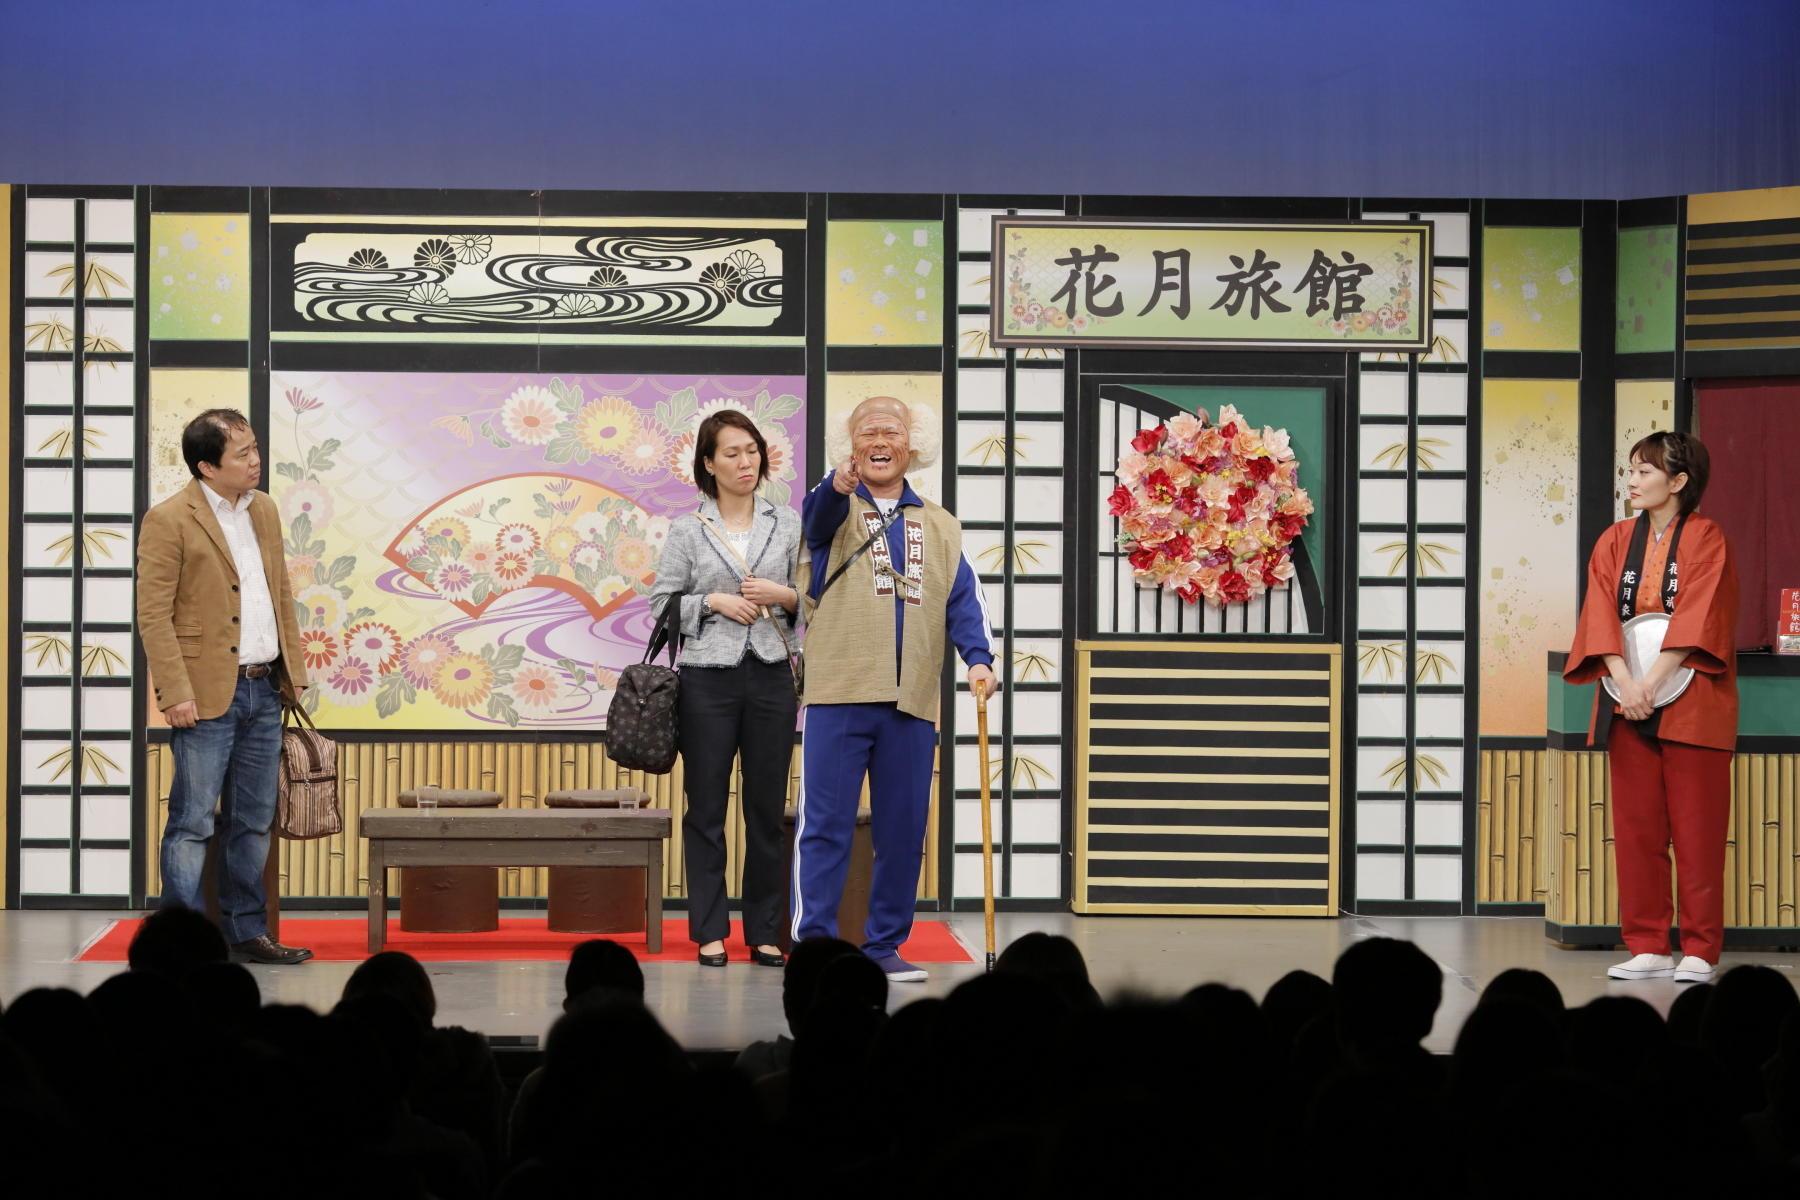 http://news.yoshimoto.co.jp/20180111235752-262db61ffd134f9ed56394b0c3ffa0de6fe17f59.jpg